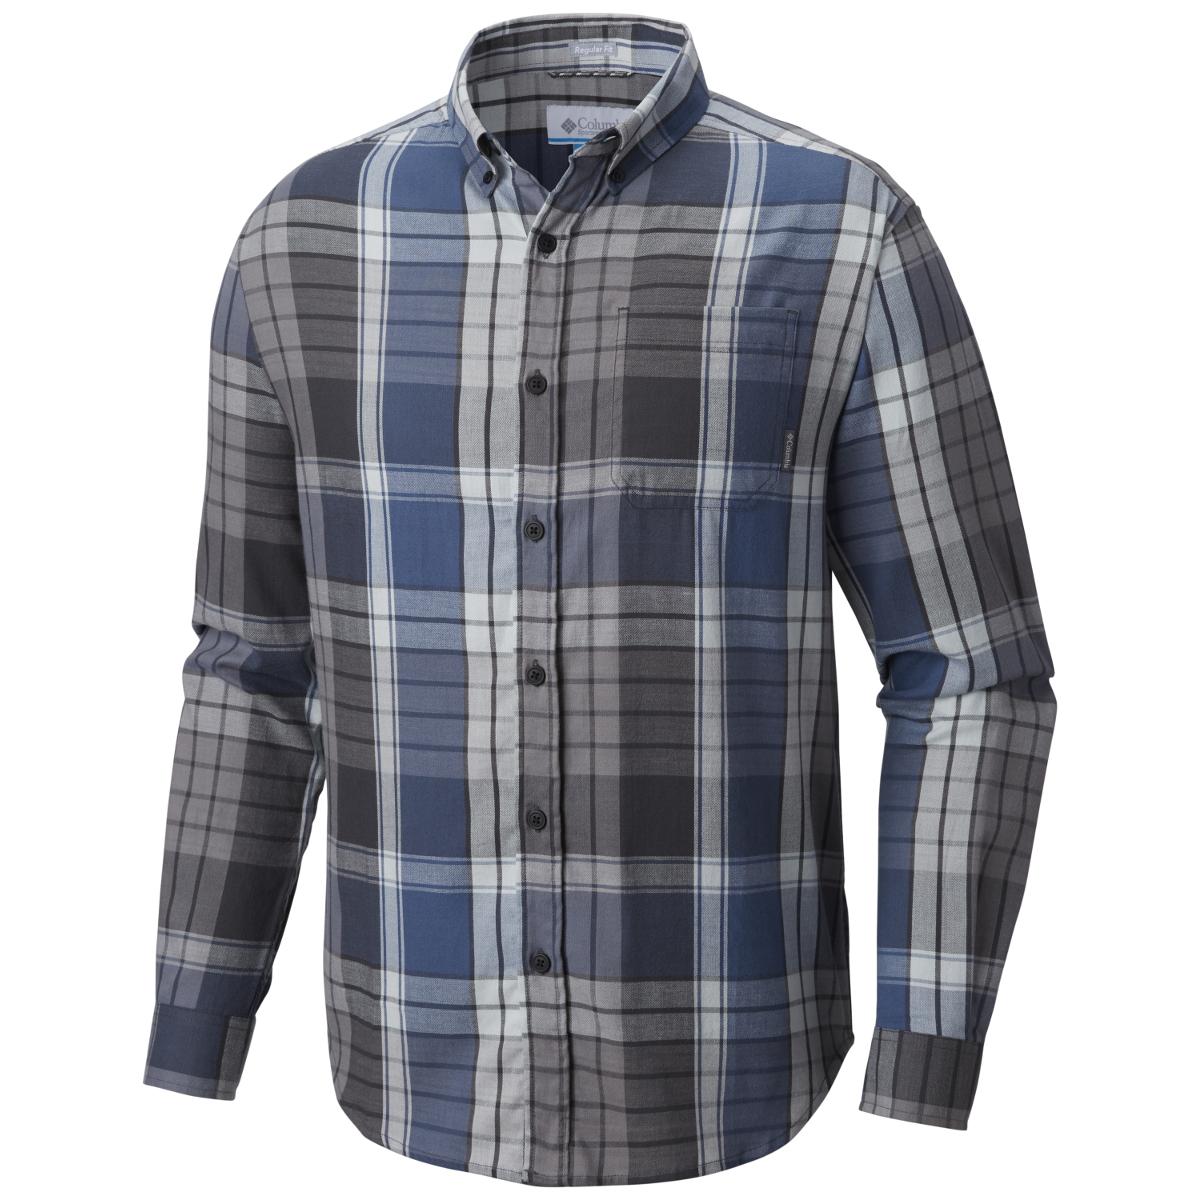 Columbia Men's Cooper Lake Plaid Long-Sleeve Shirt - Blue, M